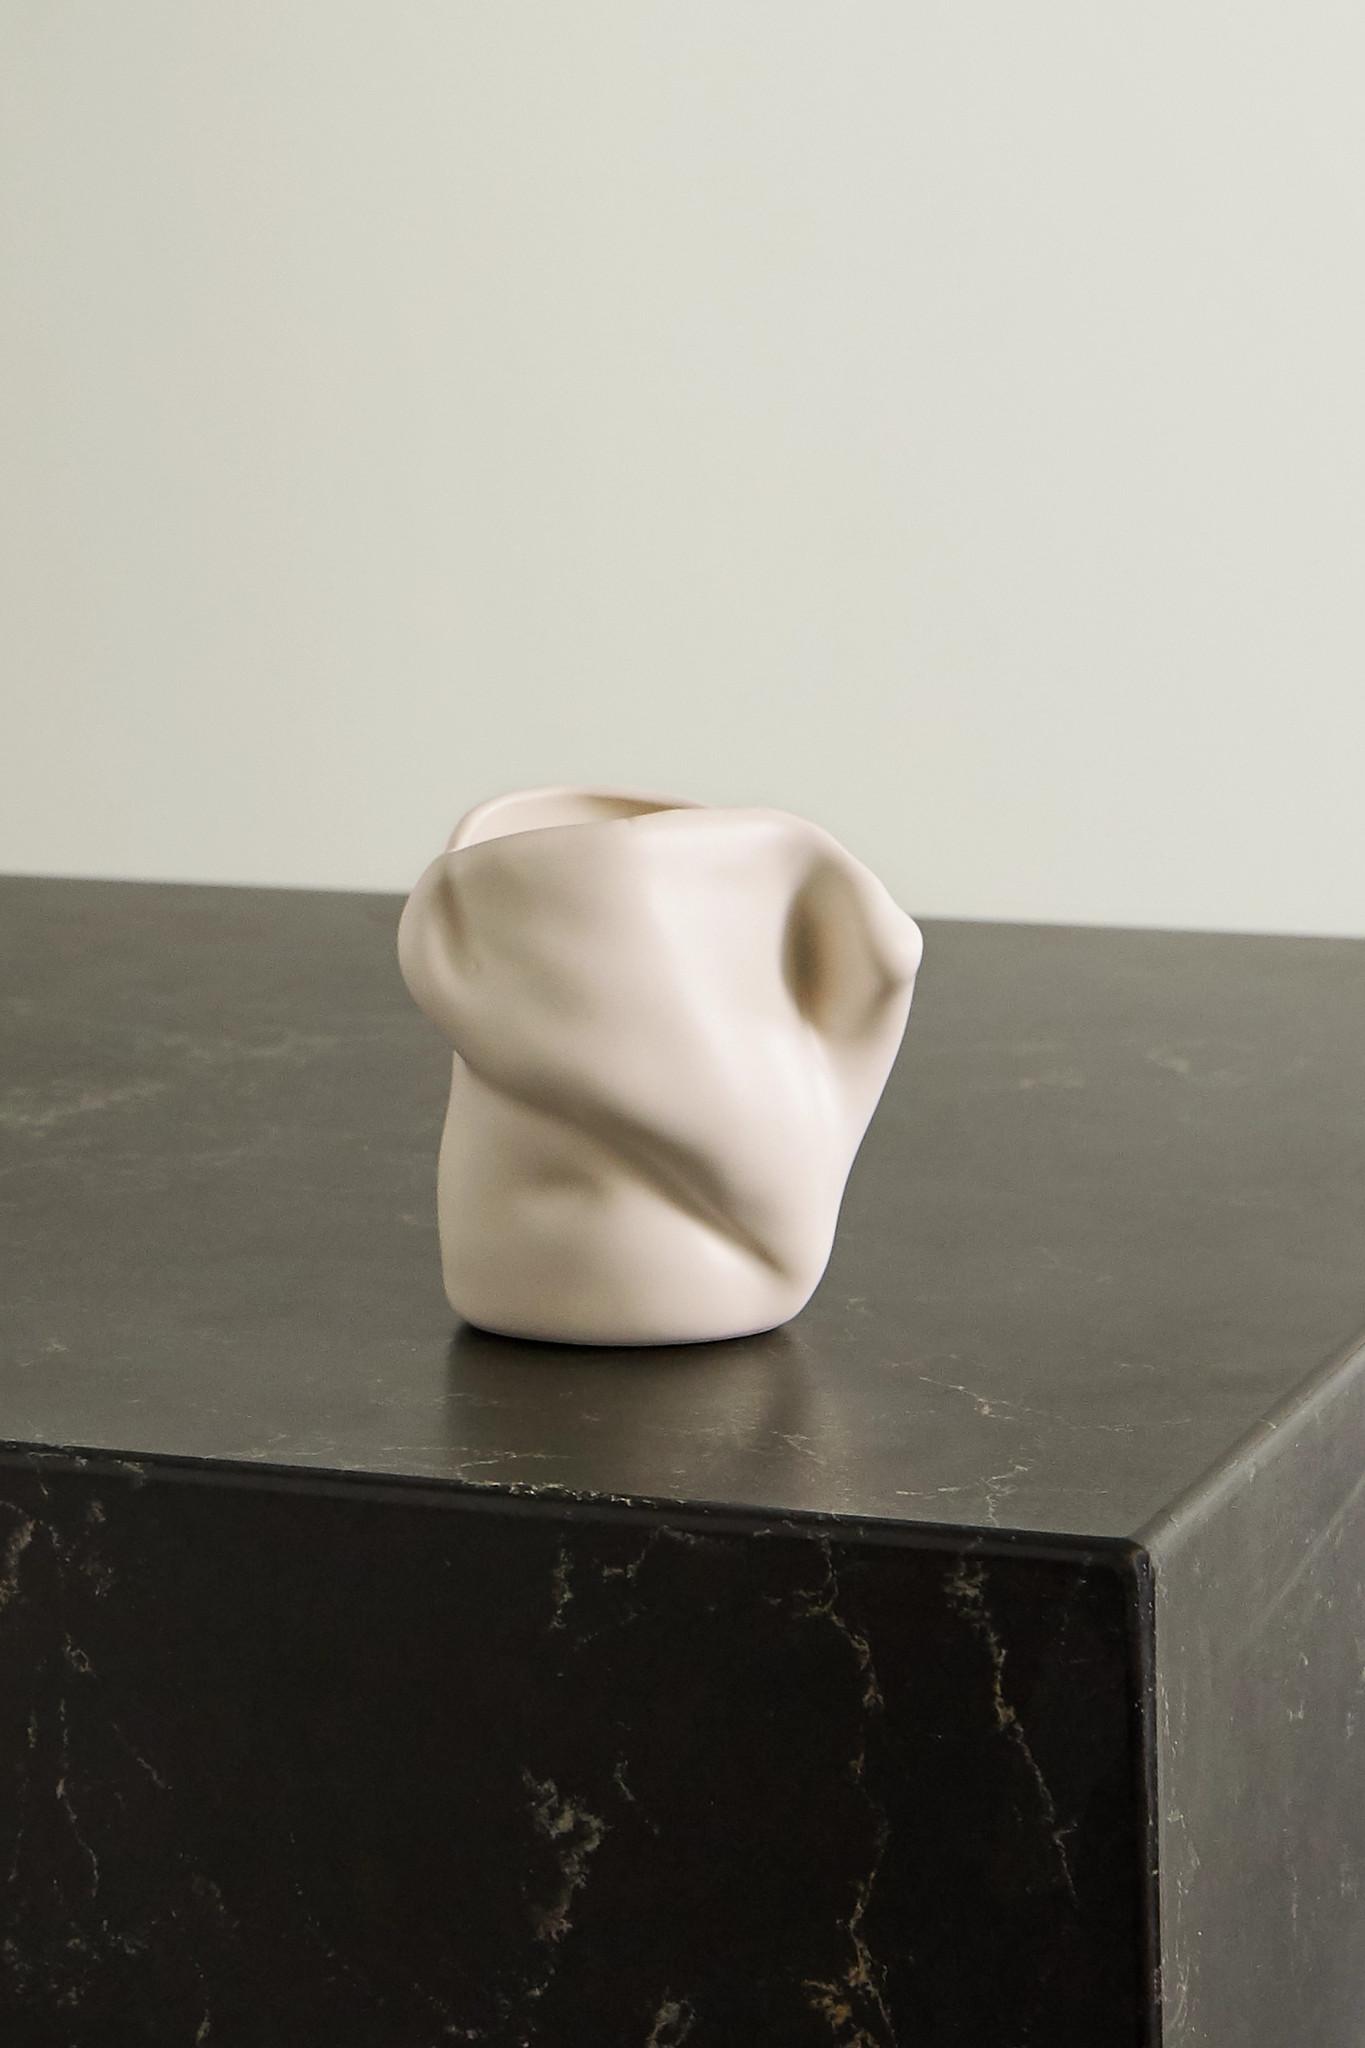 COMPLETEDWORKS - + Ekaterina Bazhenova Yamasaki Postures Small Ceramic Vase - White - one size